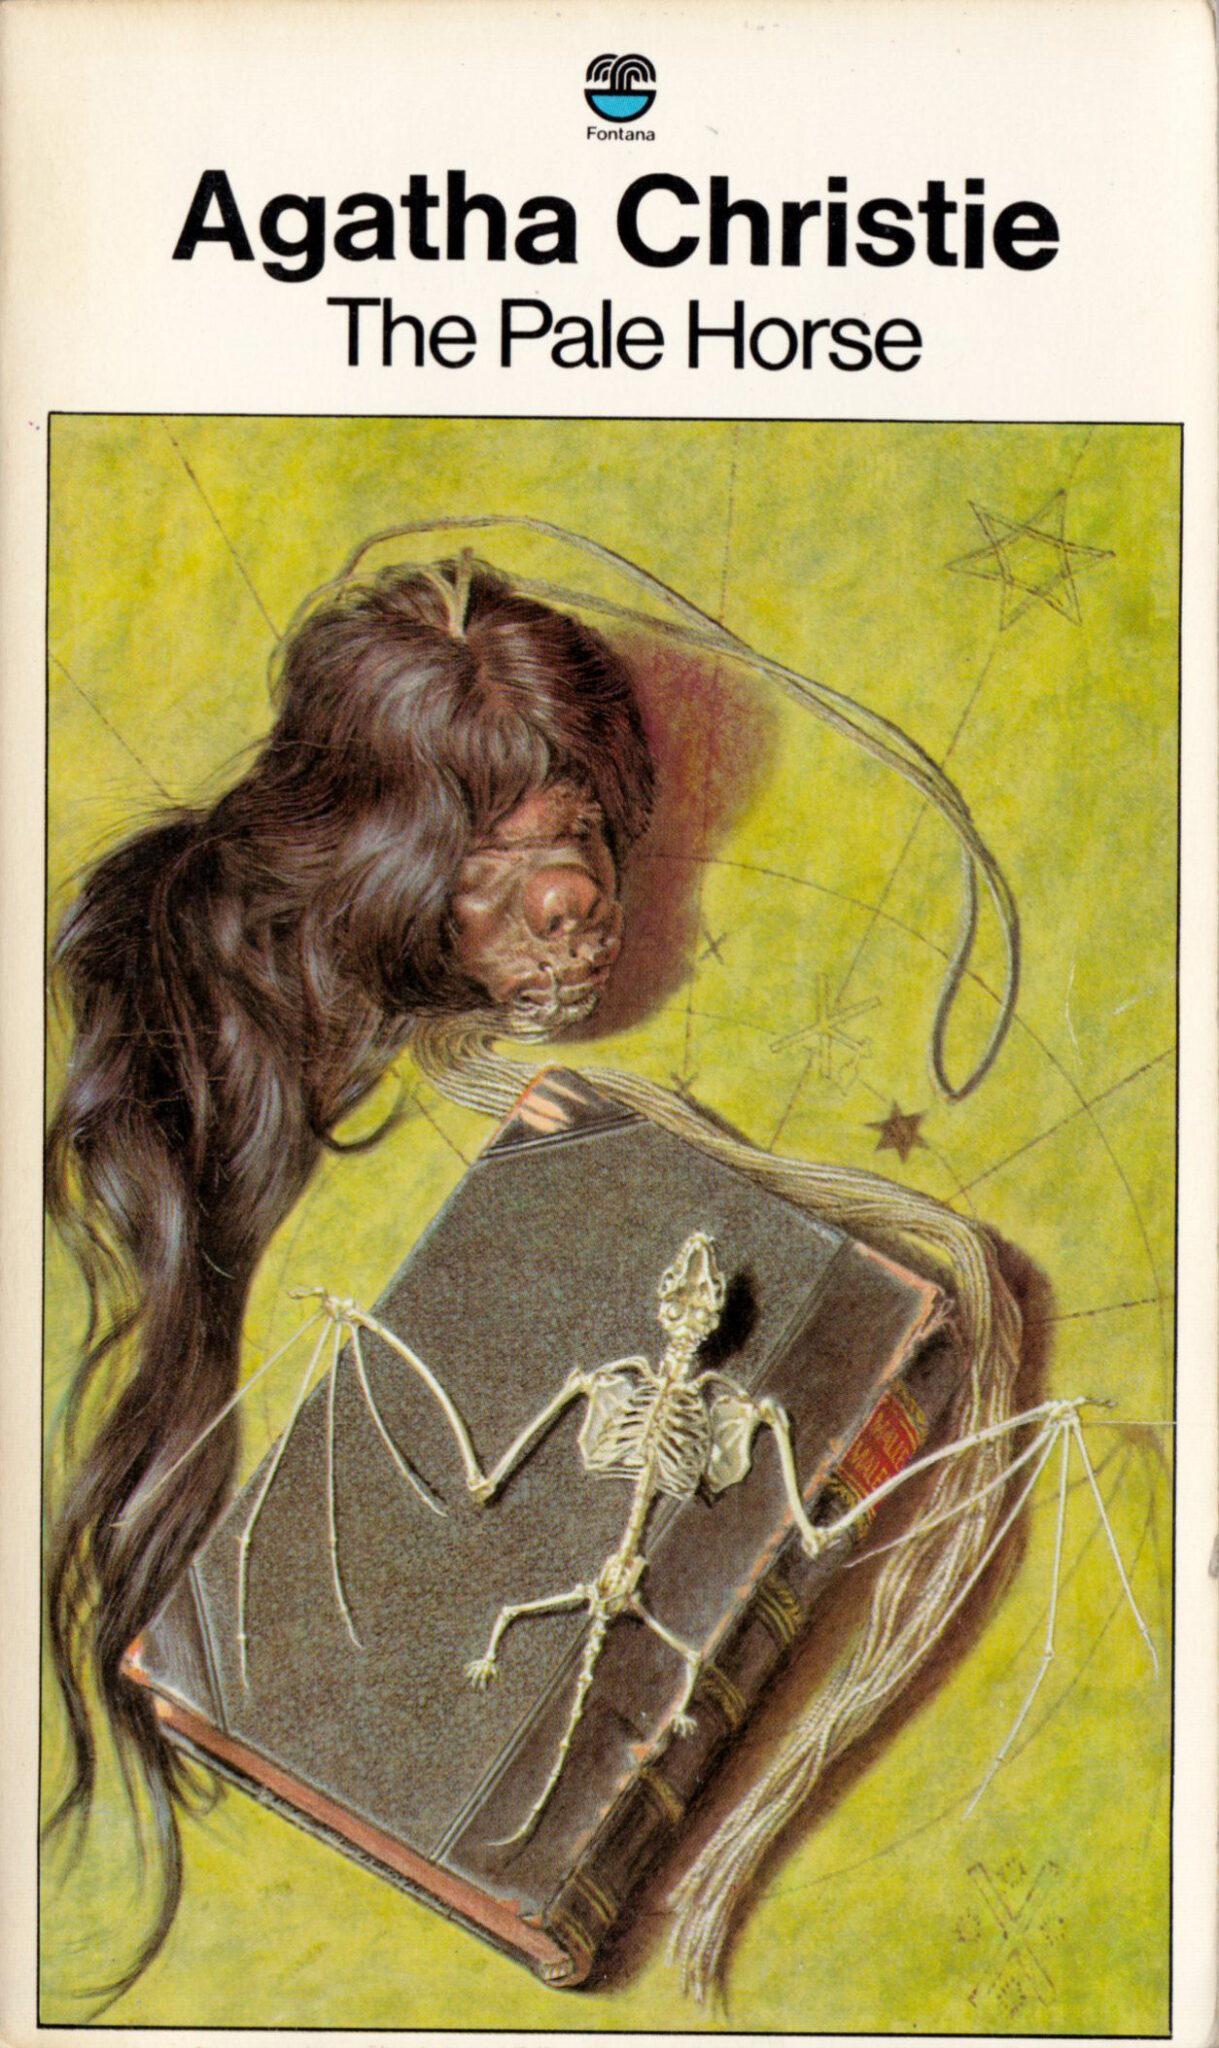 Agatha Christie Ian Robinson The Pale Horse 2 Fontana 1974